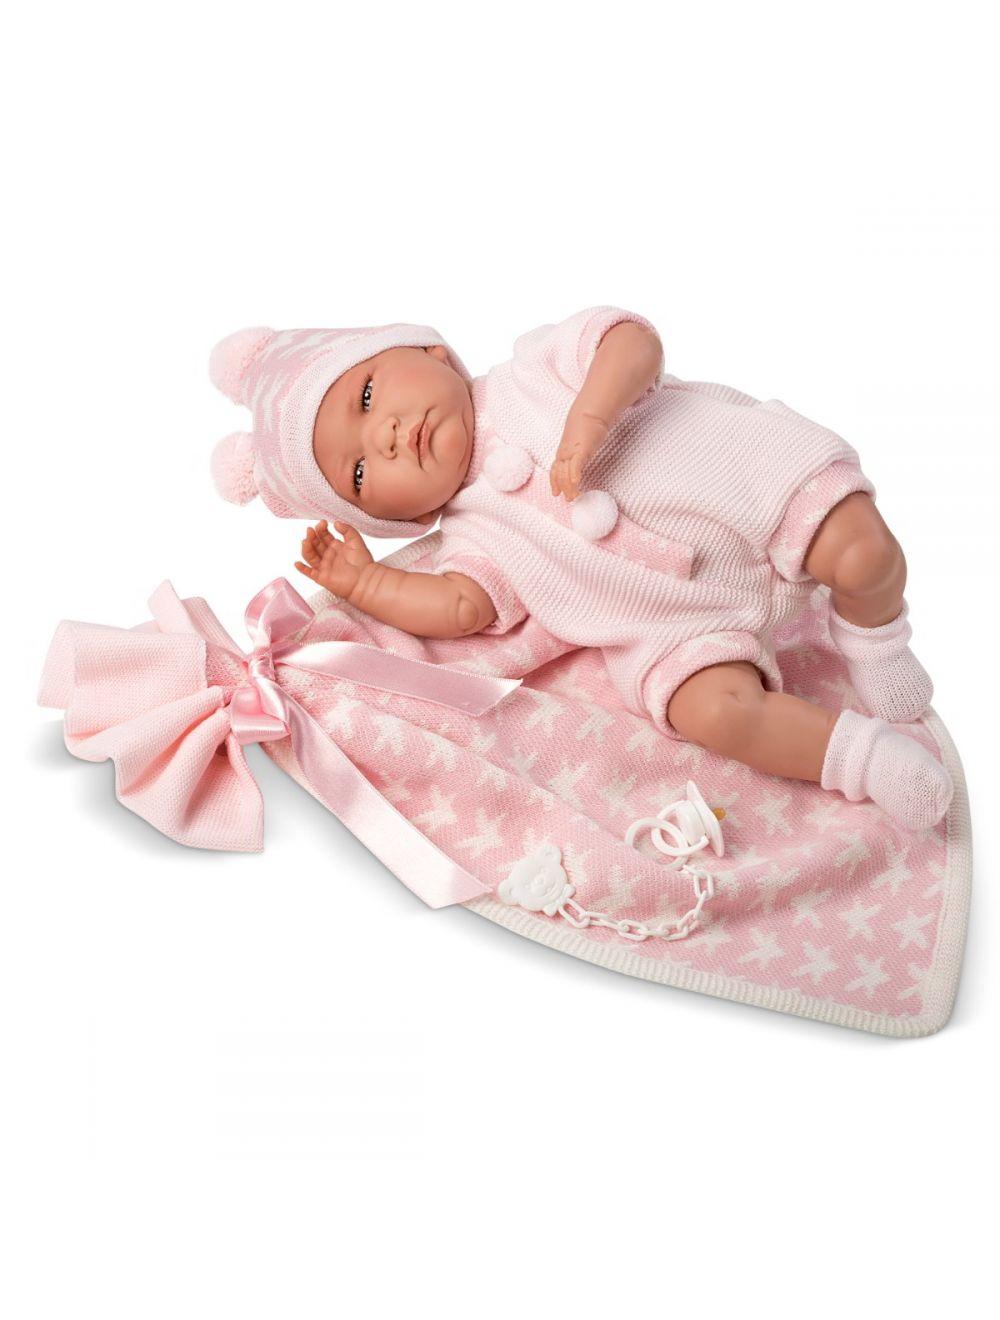 LLORENS Lalka Lala z różowymi gwiazdkami 40 cm